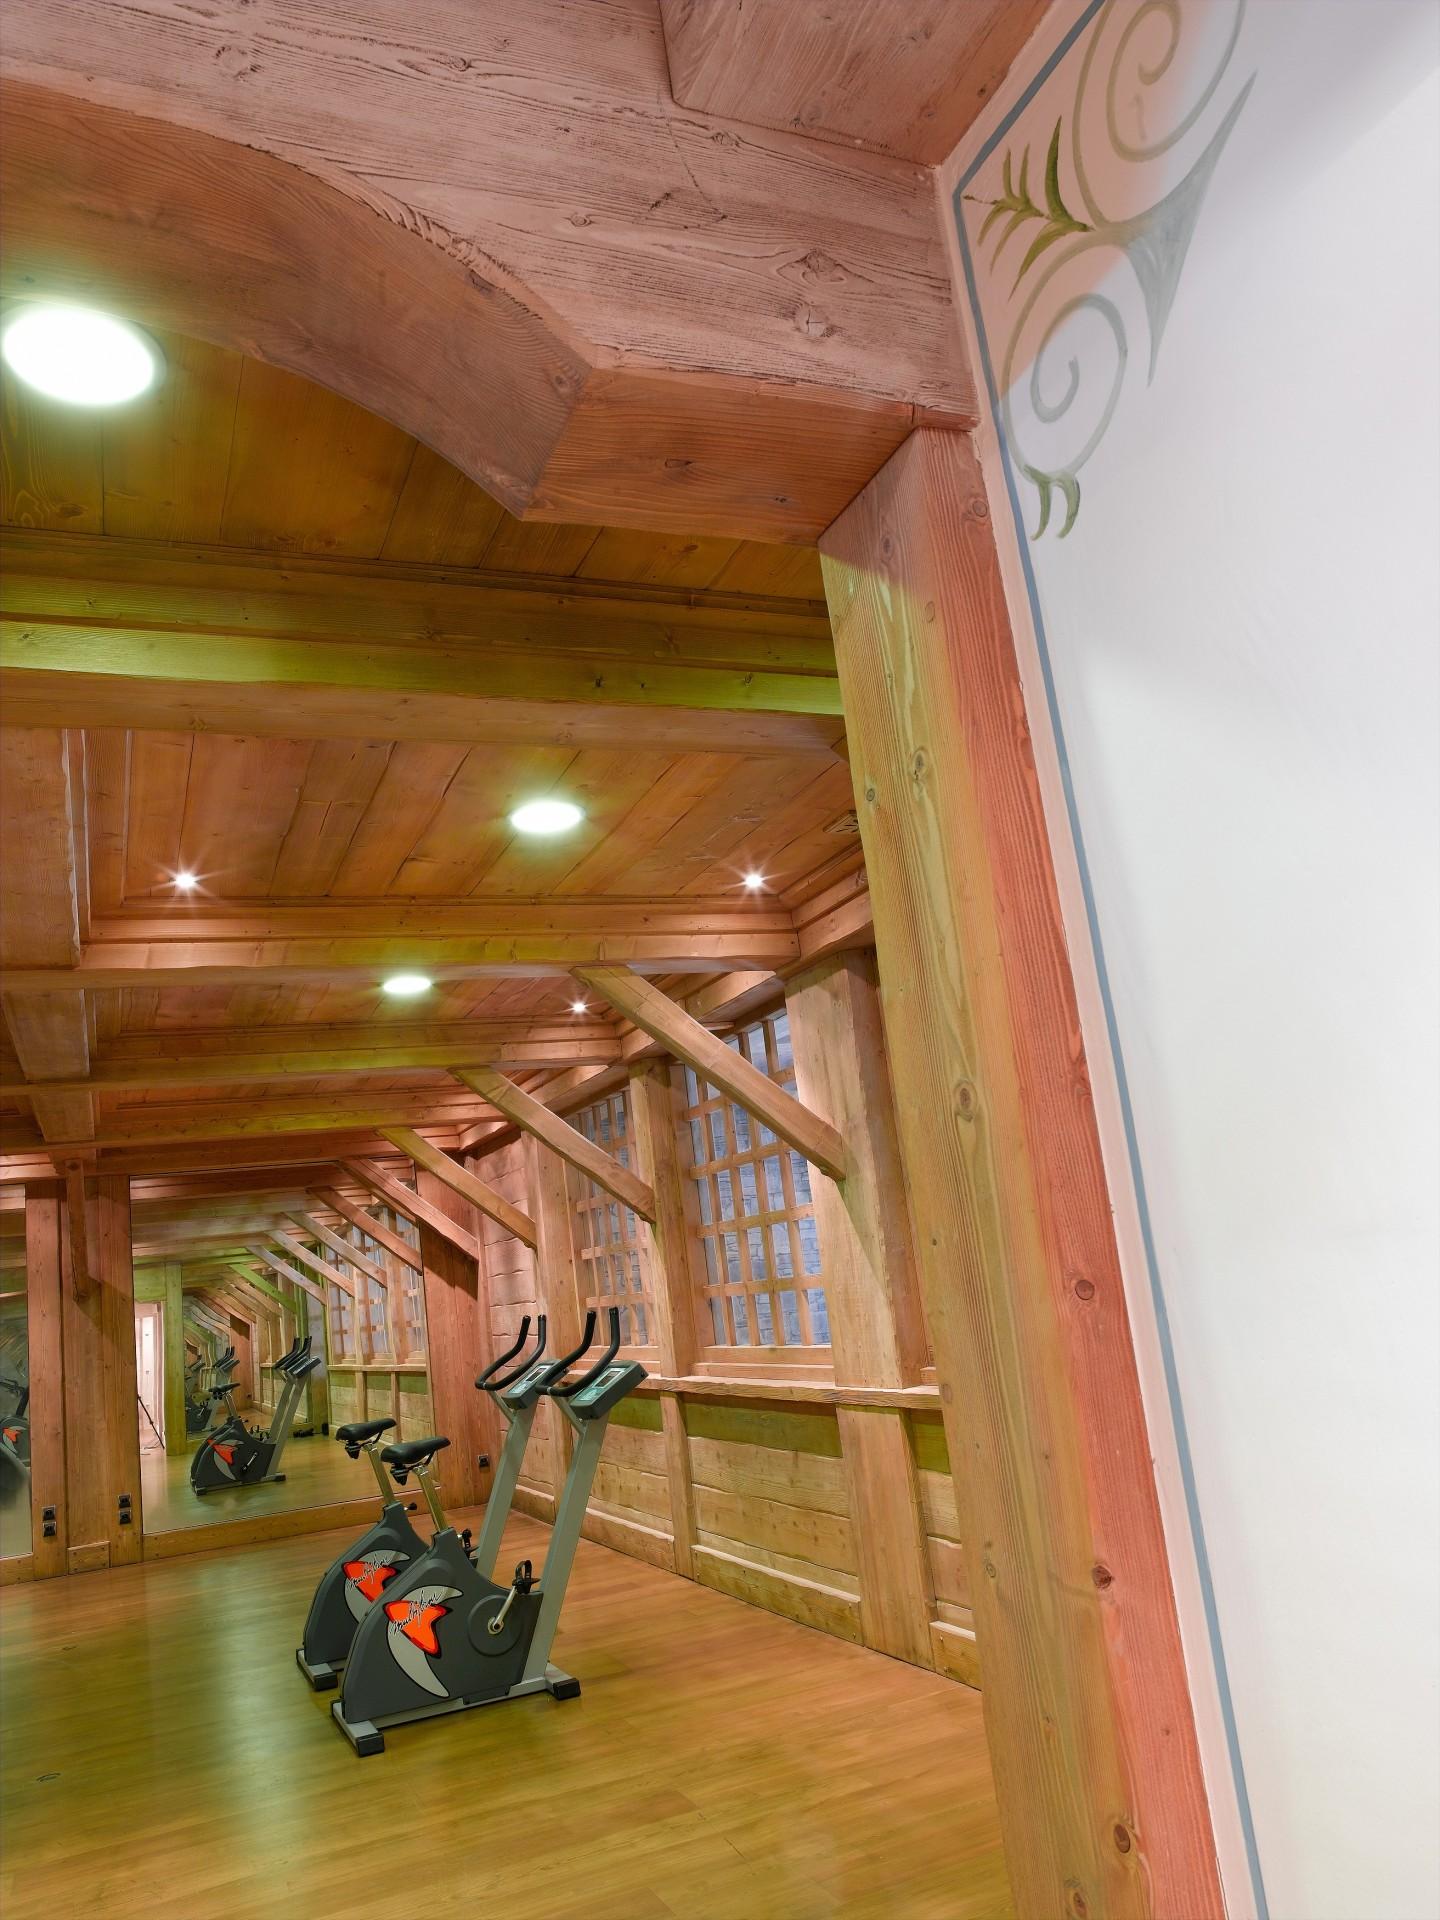 Les Saisies Location Appartement Luxe Lebercice Salle De Fitness